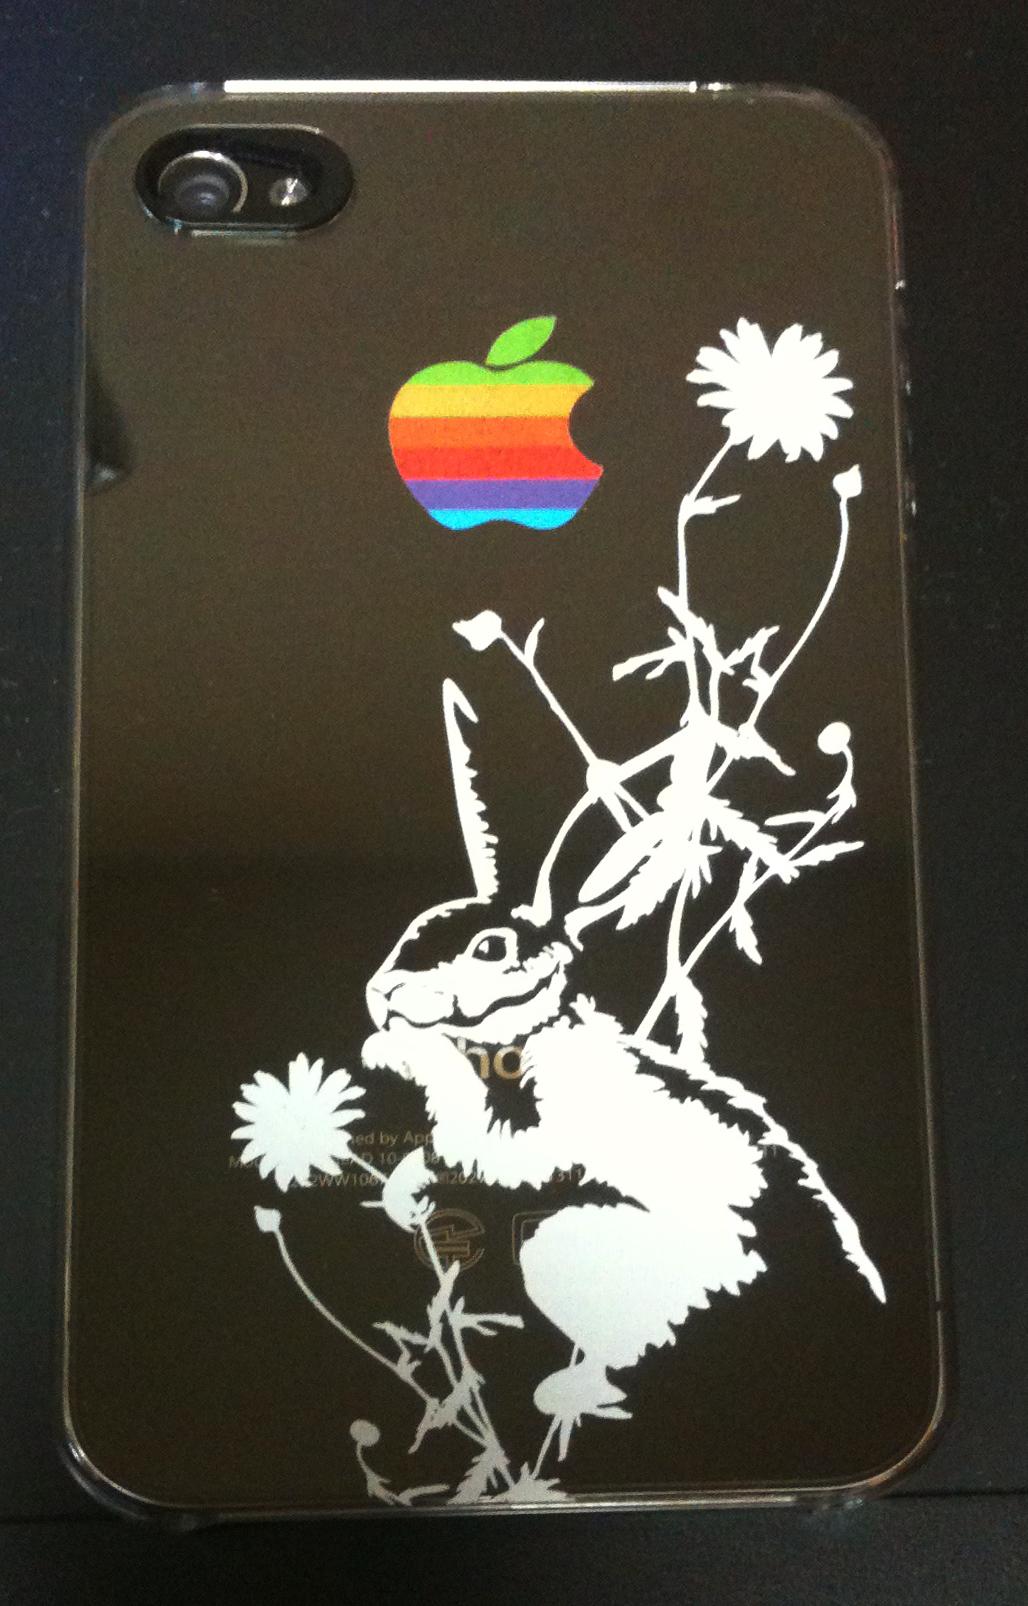 iPad,iPhone 4,Apple TV,MacBook Air ・・・